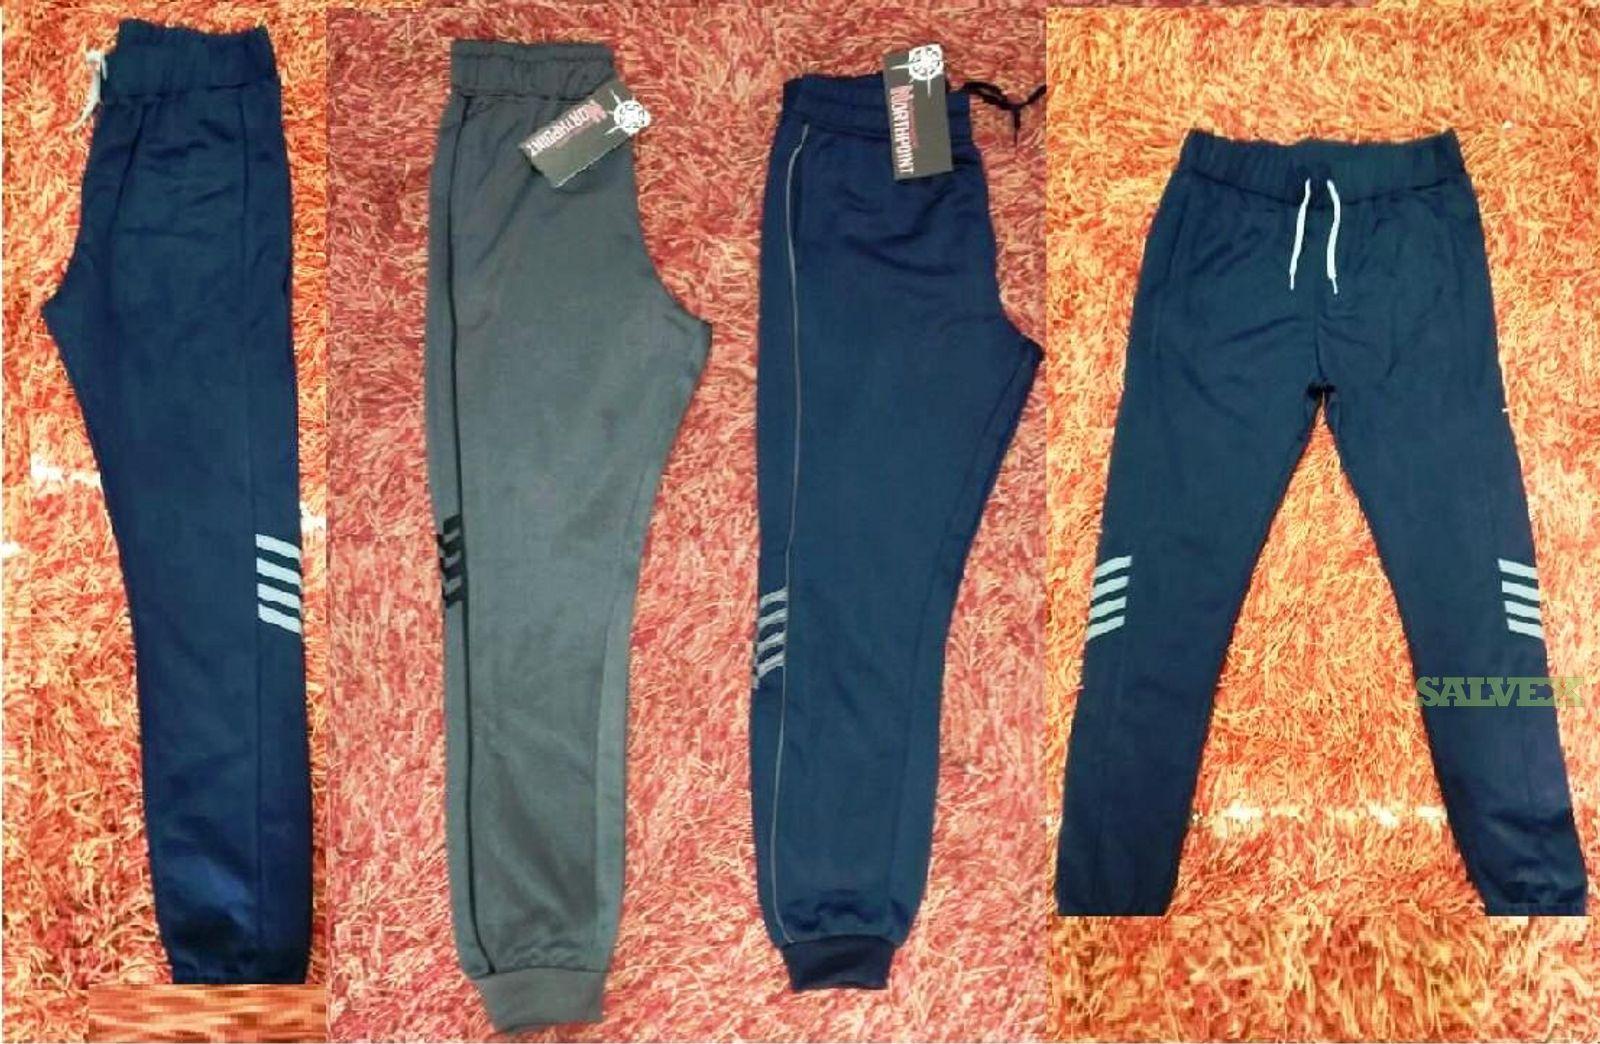 Boys Track Pants (6,000 Units) in NJ